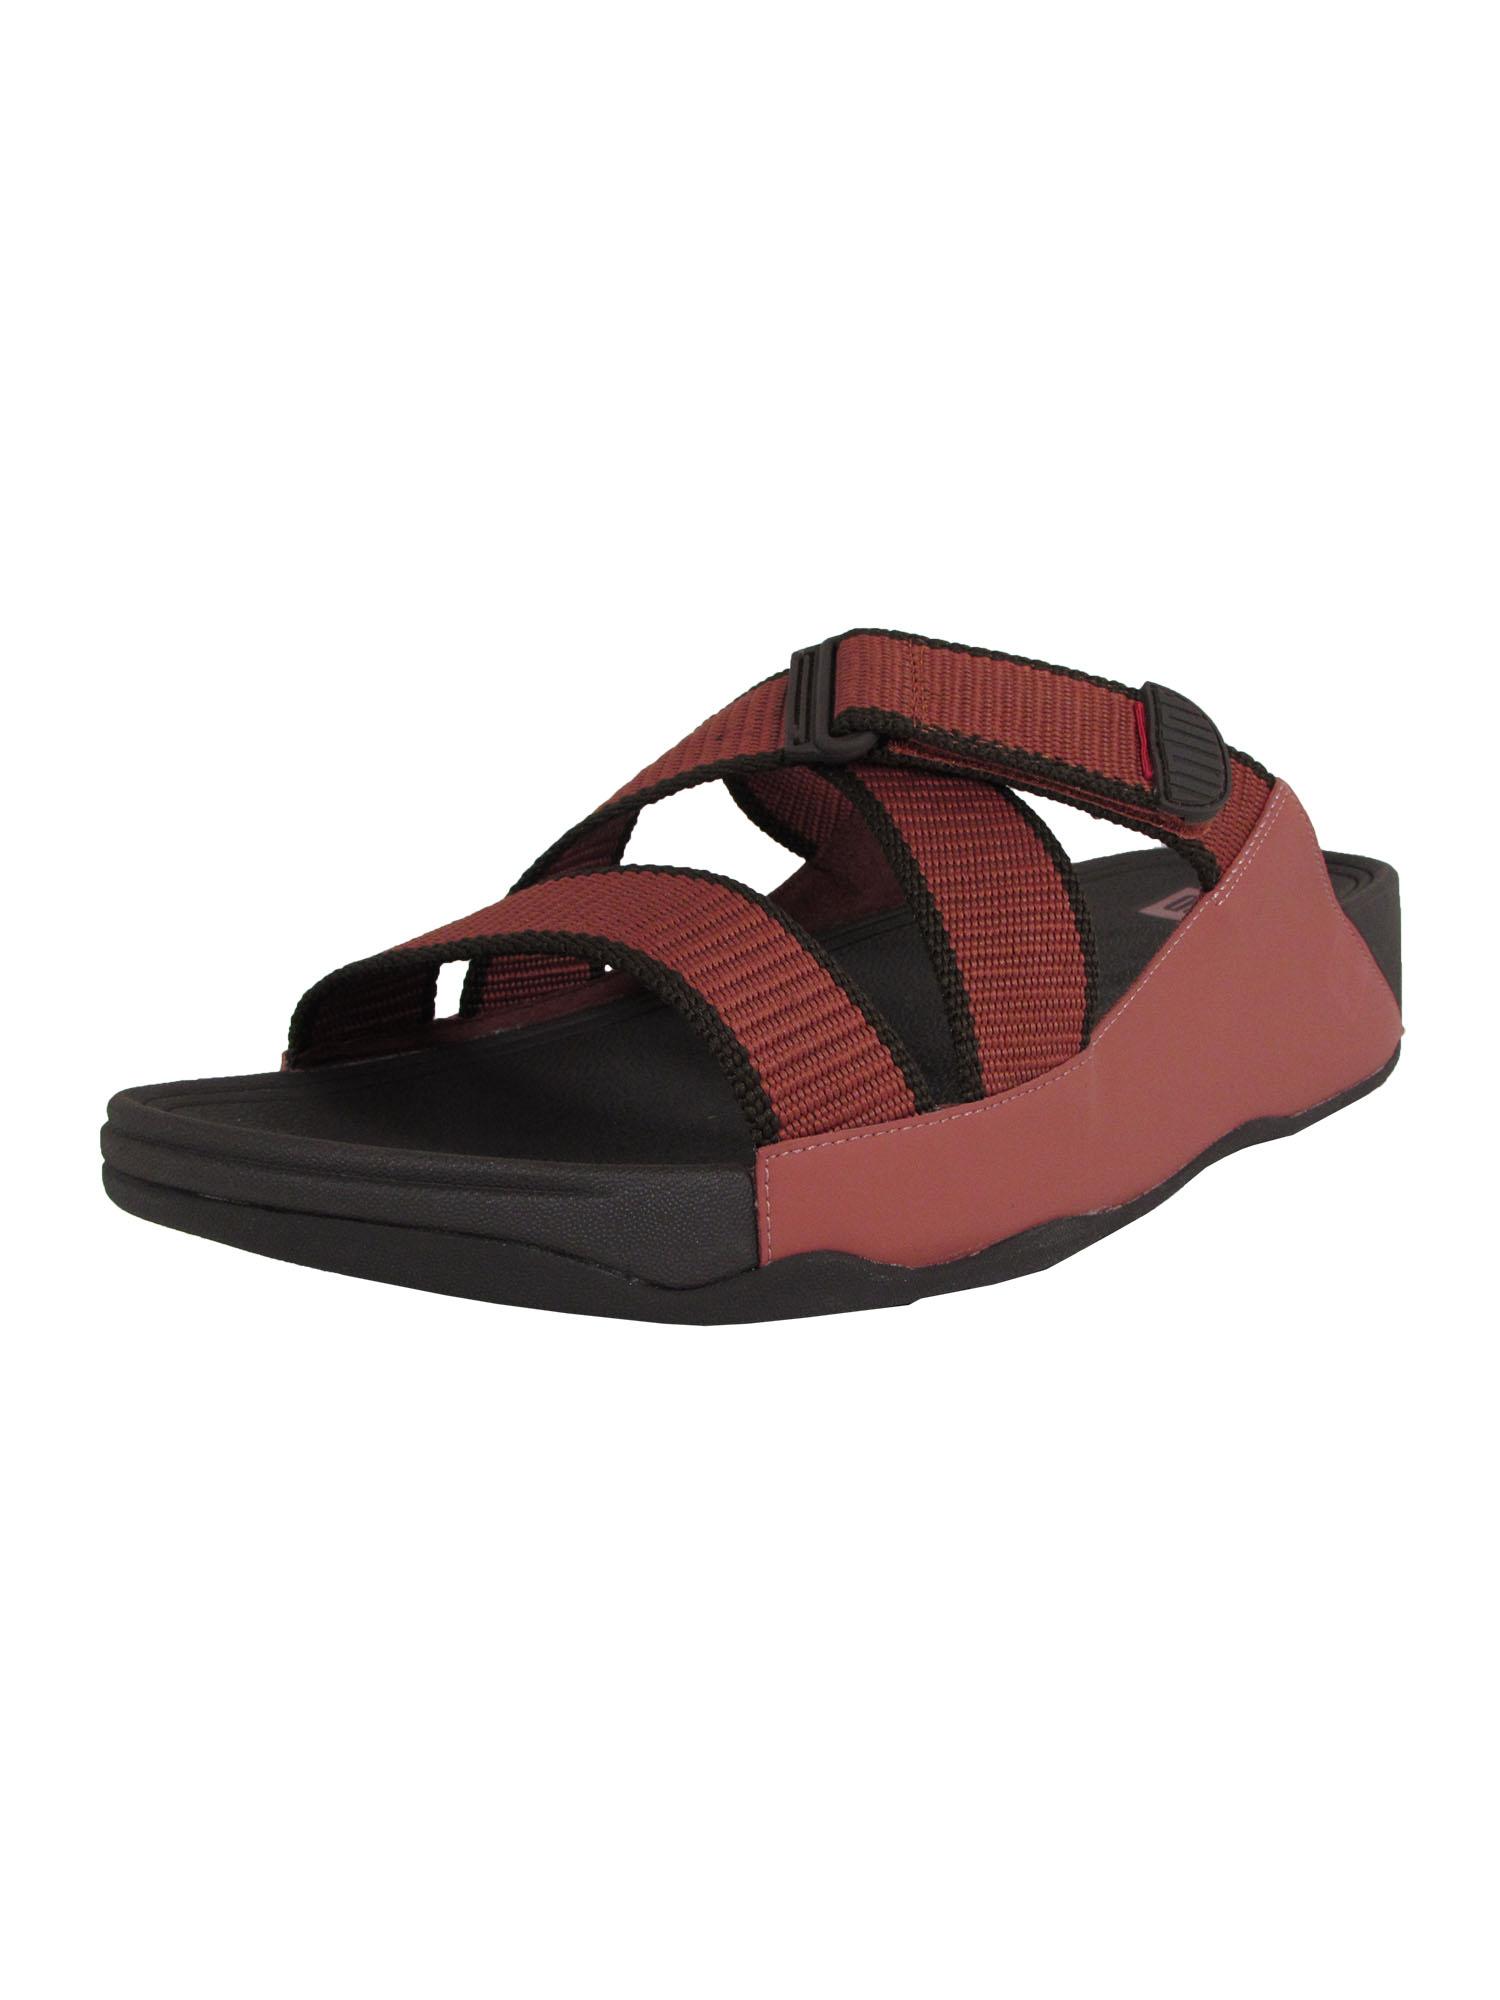 Fitflop-Mens-Sling-II-Webbing-Slide-Sandal-Shoes thumbnail 5